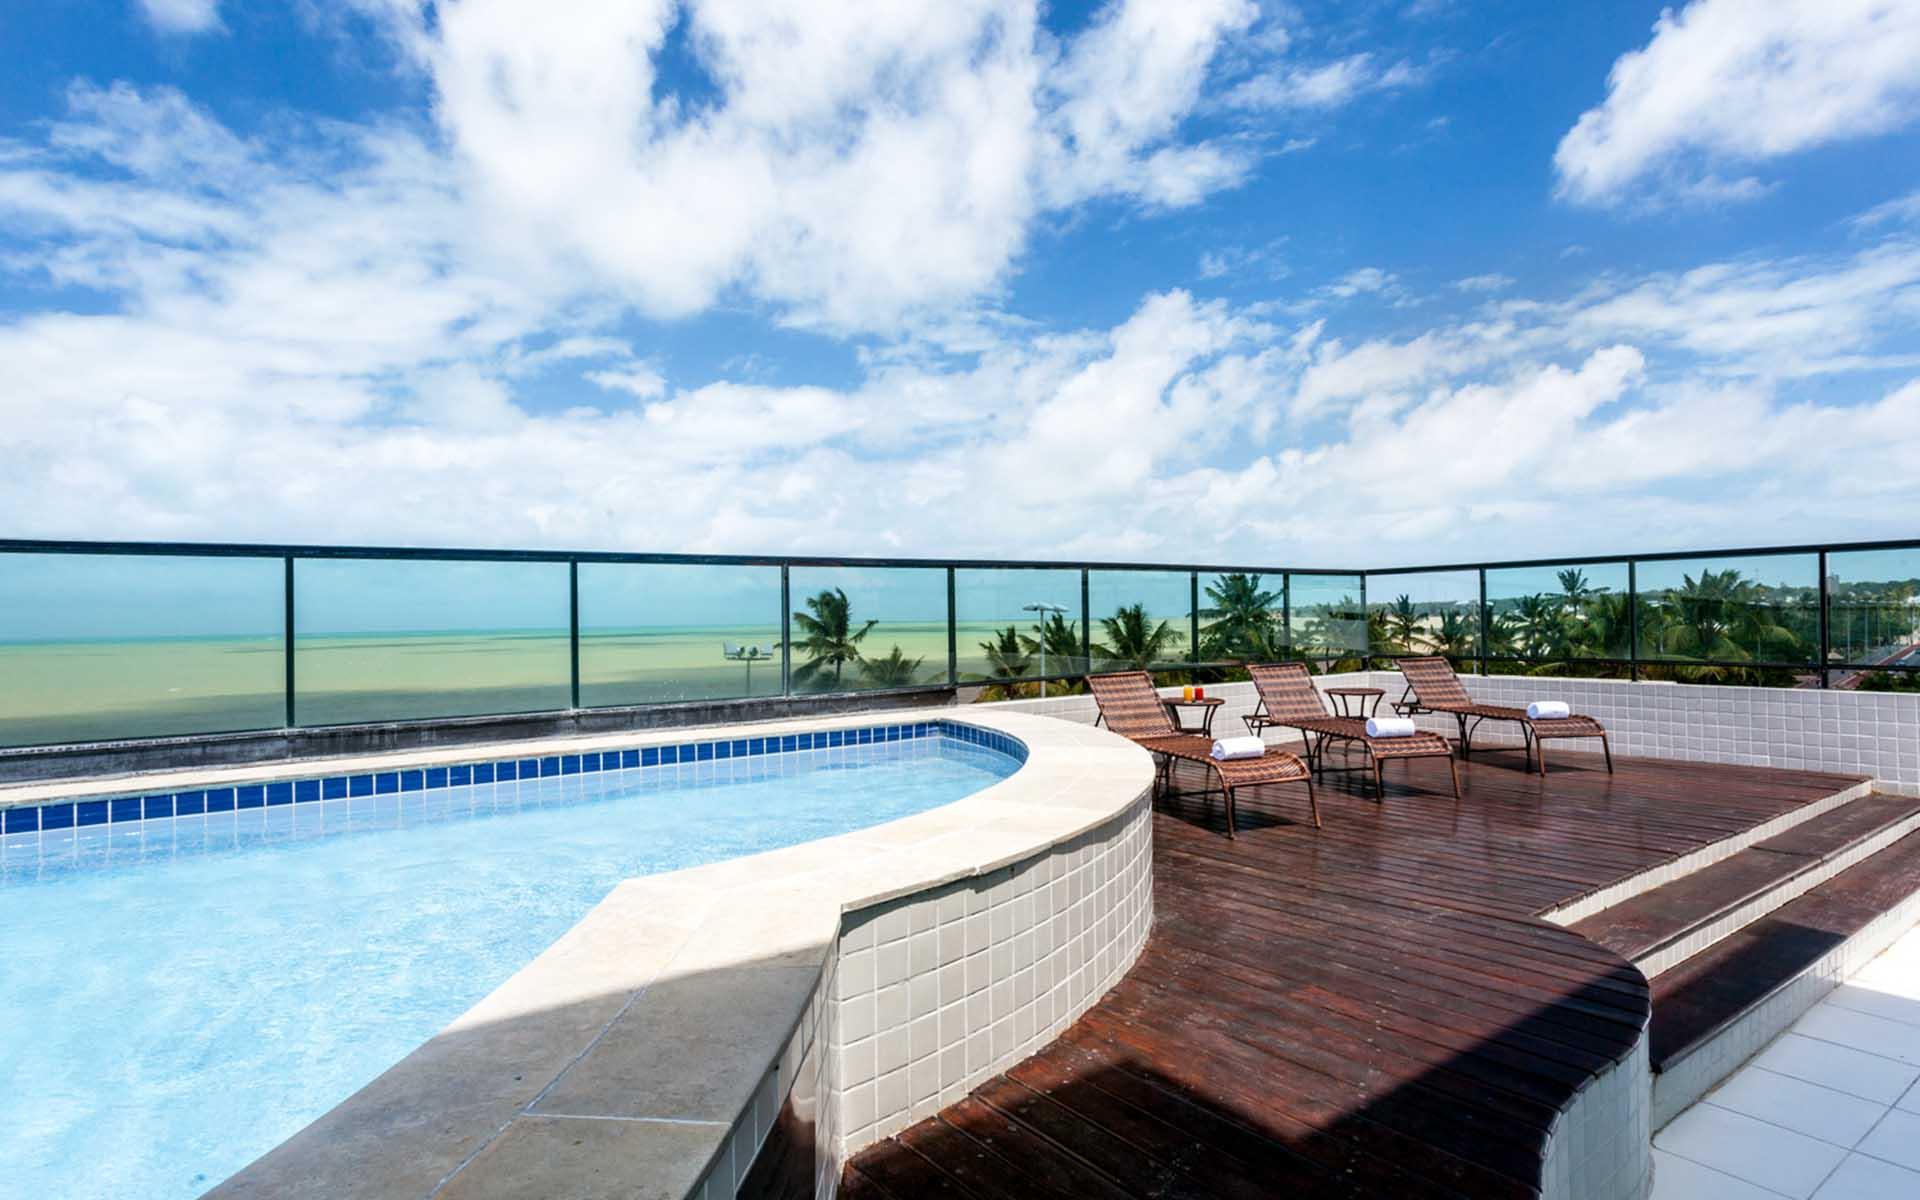 piscina_hotel_joao_pessoa_hplus_beach (10)